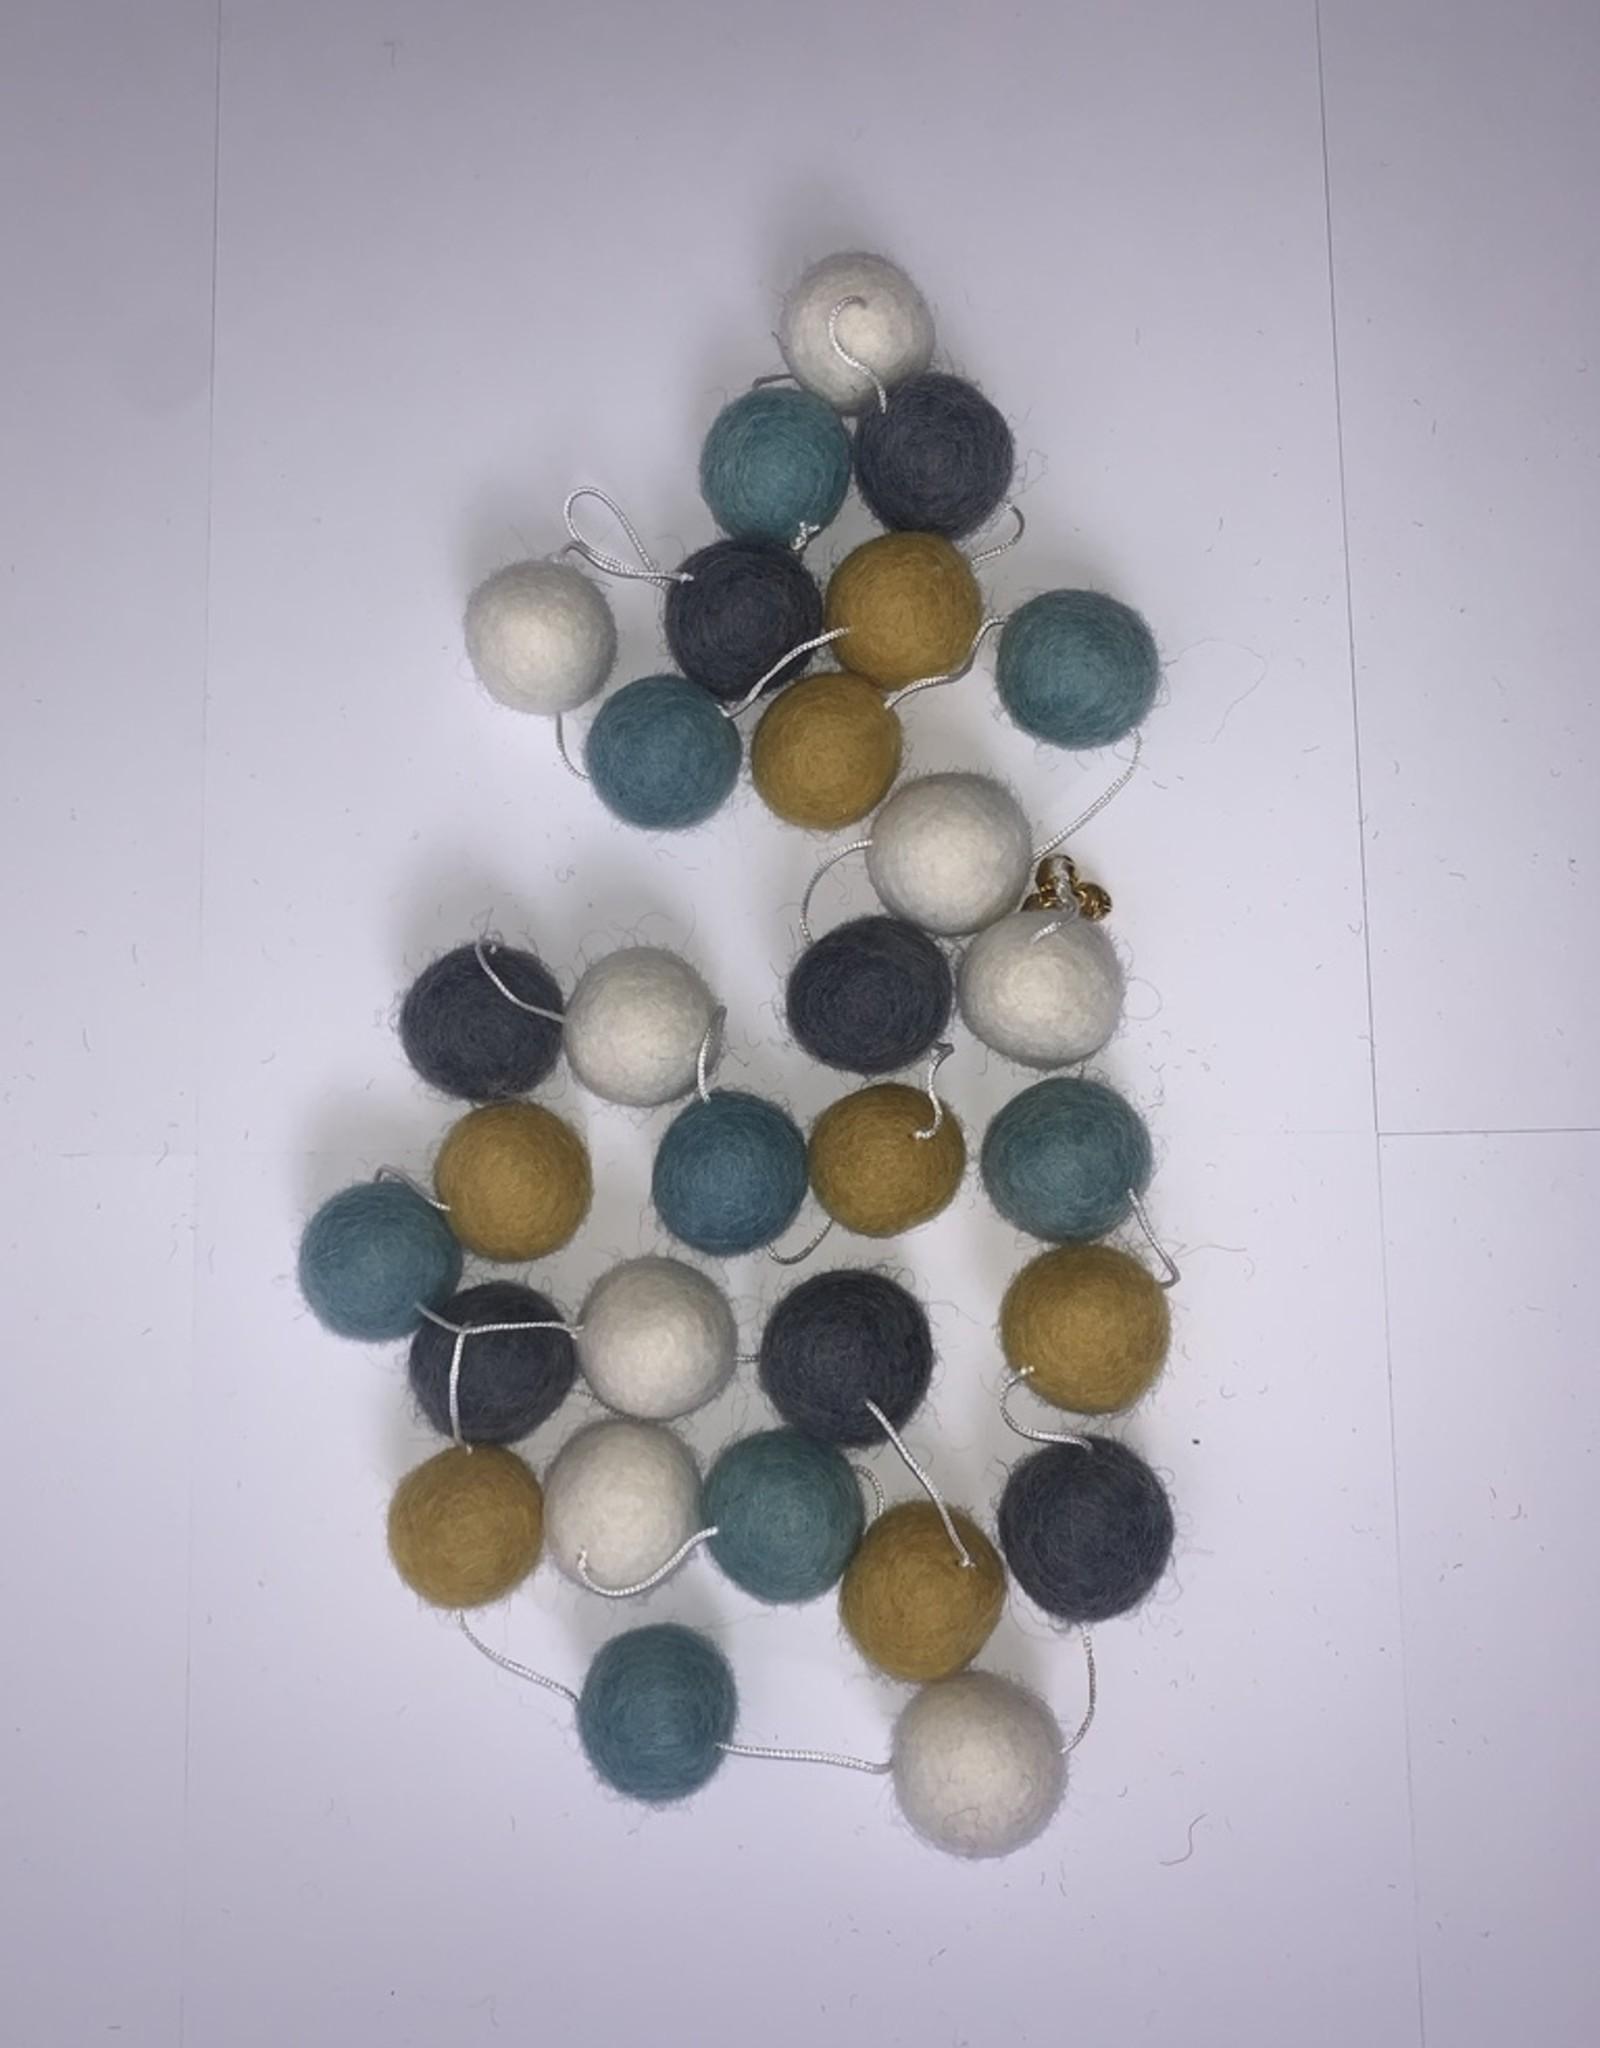 Filz Girlande Blue Grey 100% Wolle